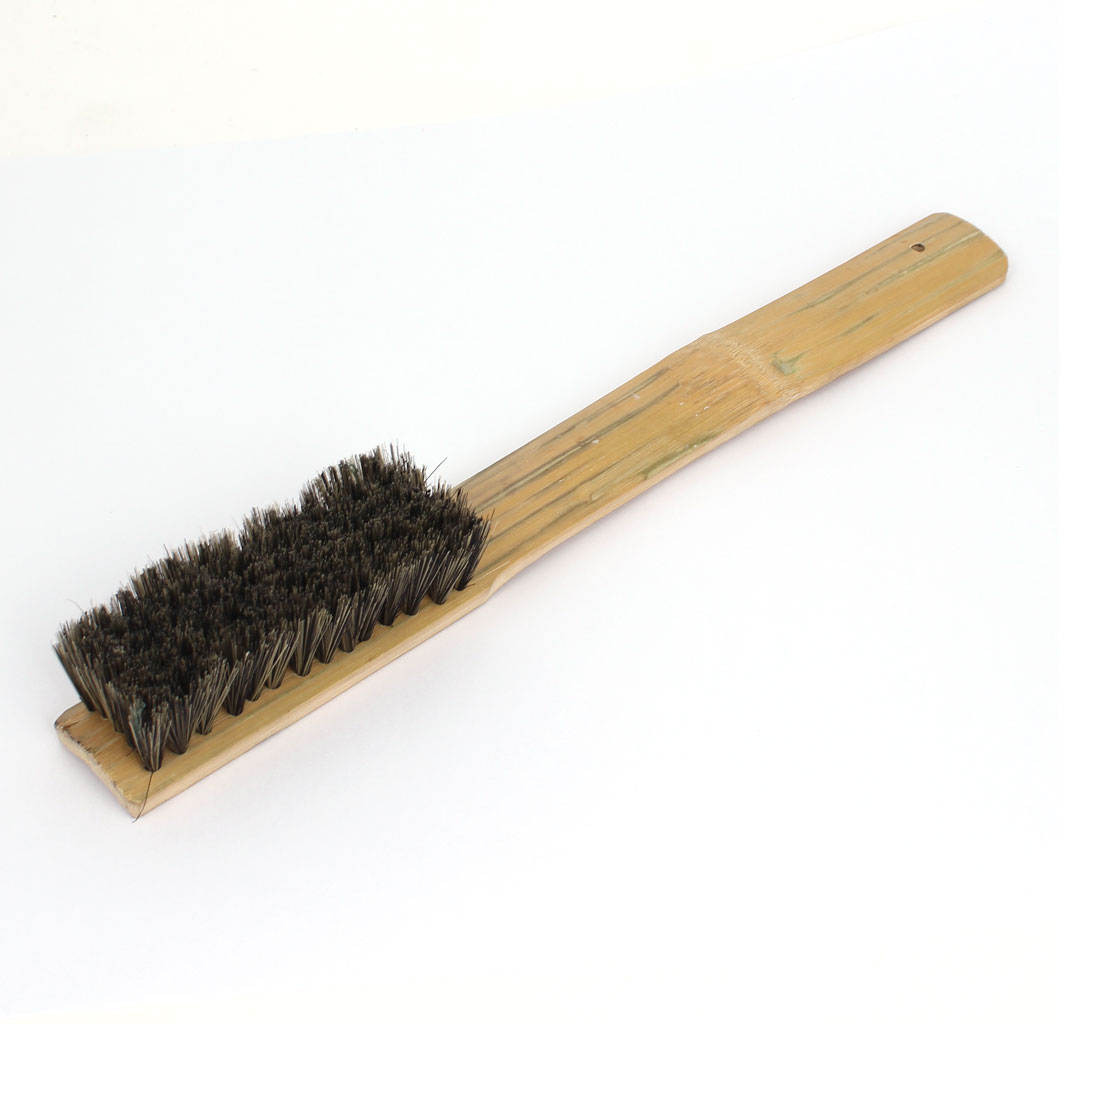 285mm Long Bamboo Handle Handheld Bristle Brush Cleaning Tool Gray